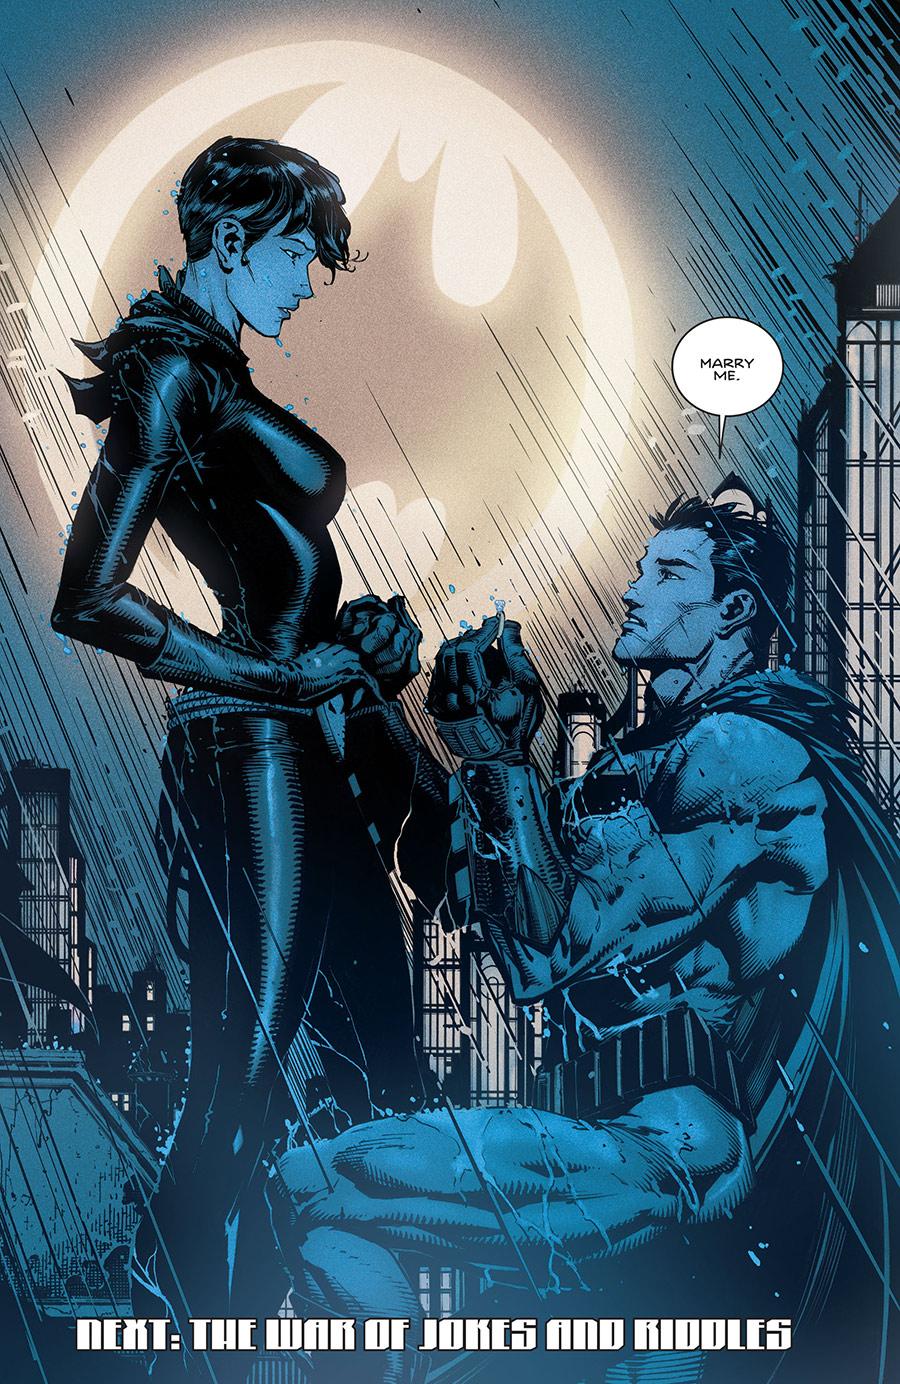 Batman Issue 24